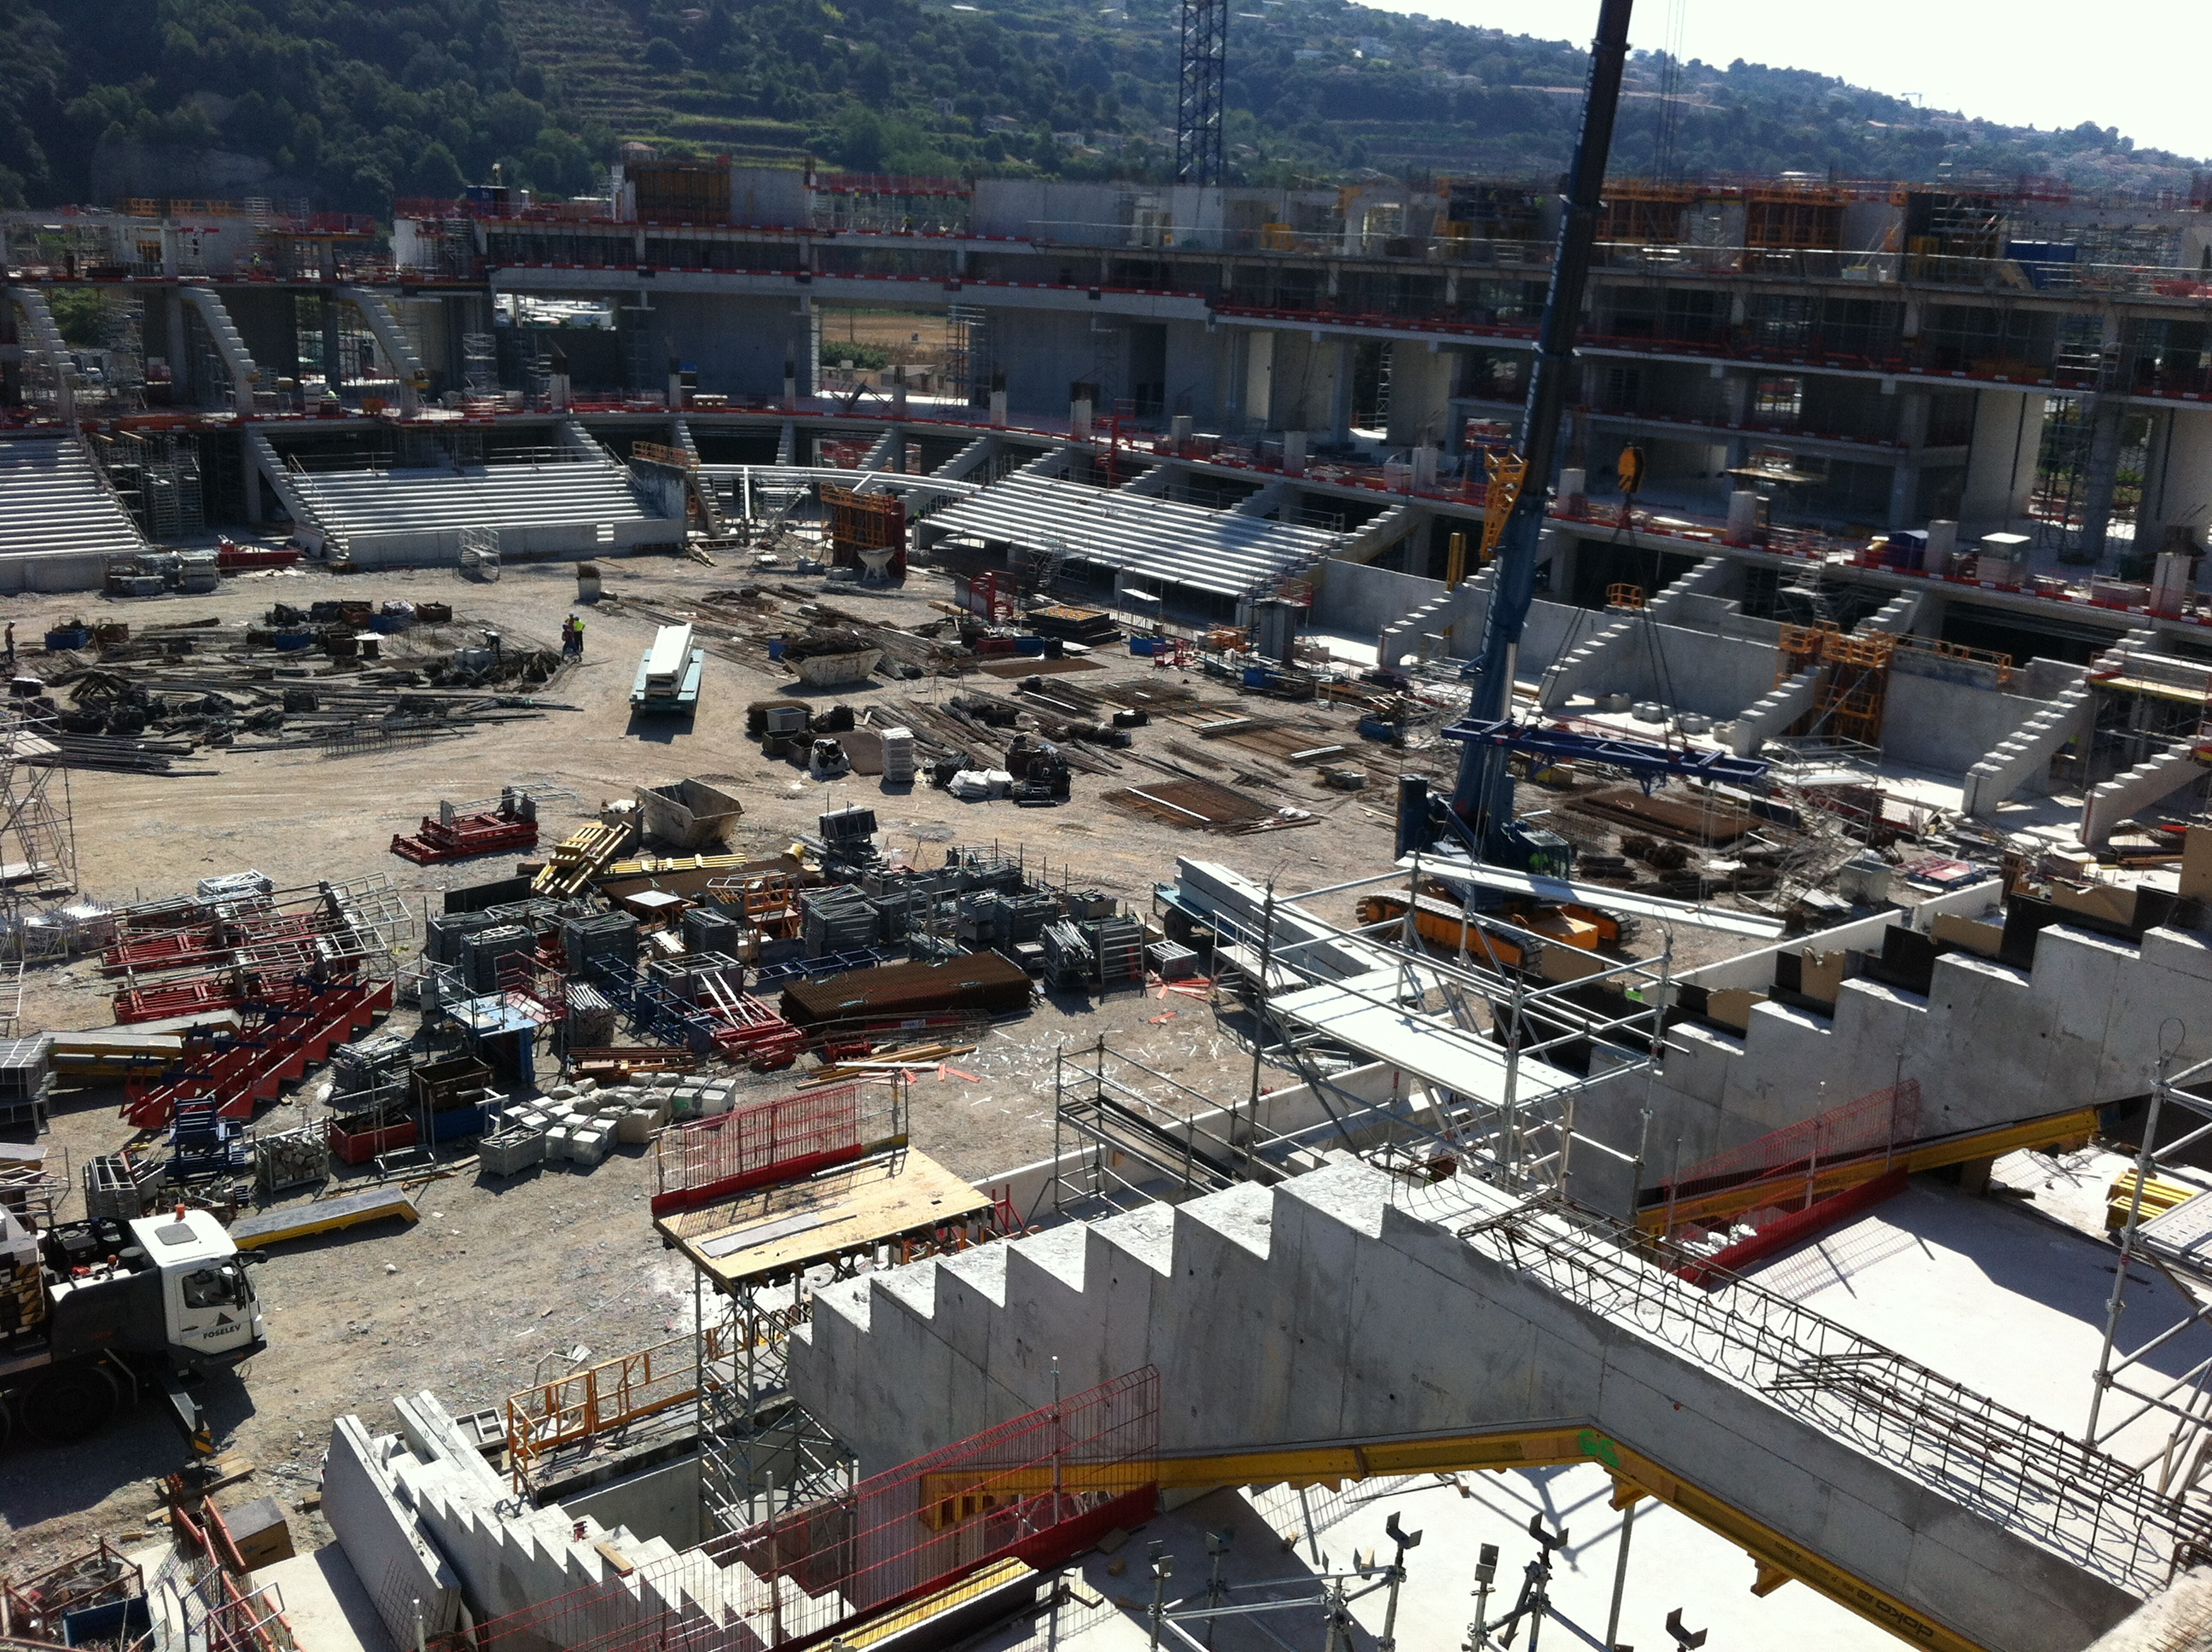 http://www.info-stades.fr/forum/ressources/image/20515